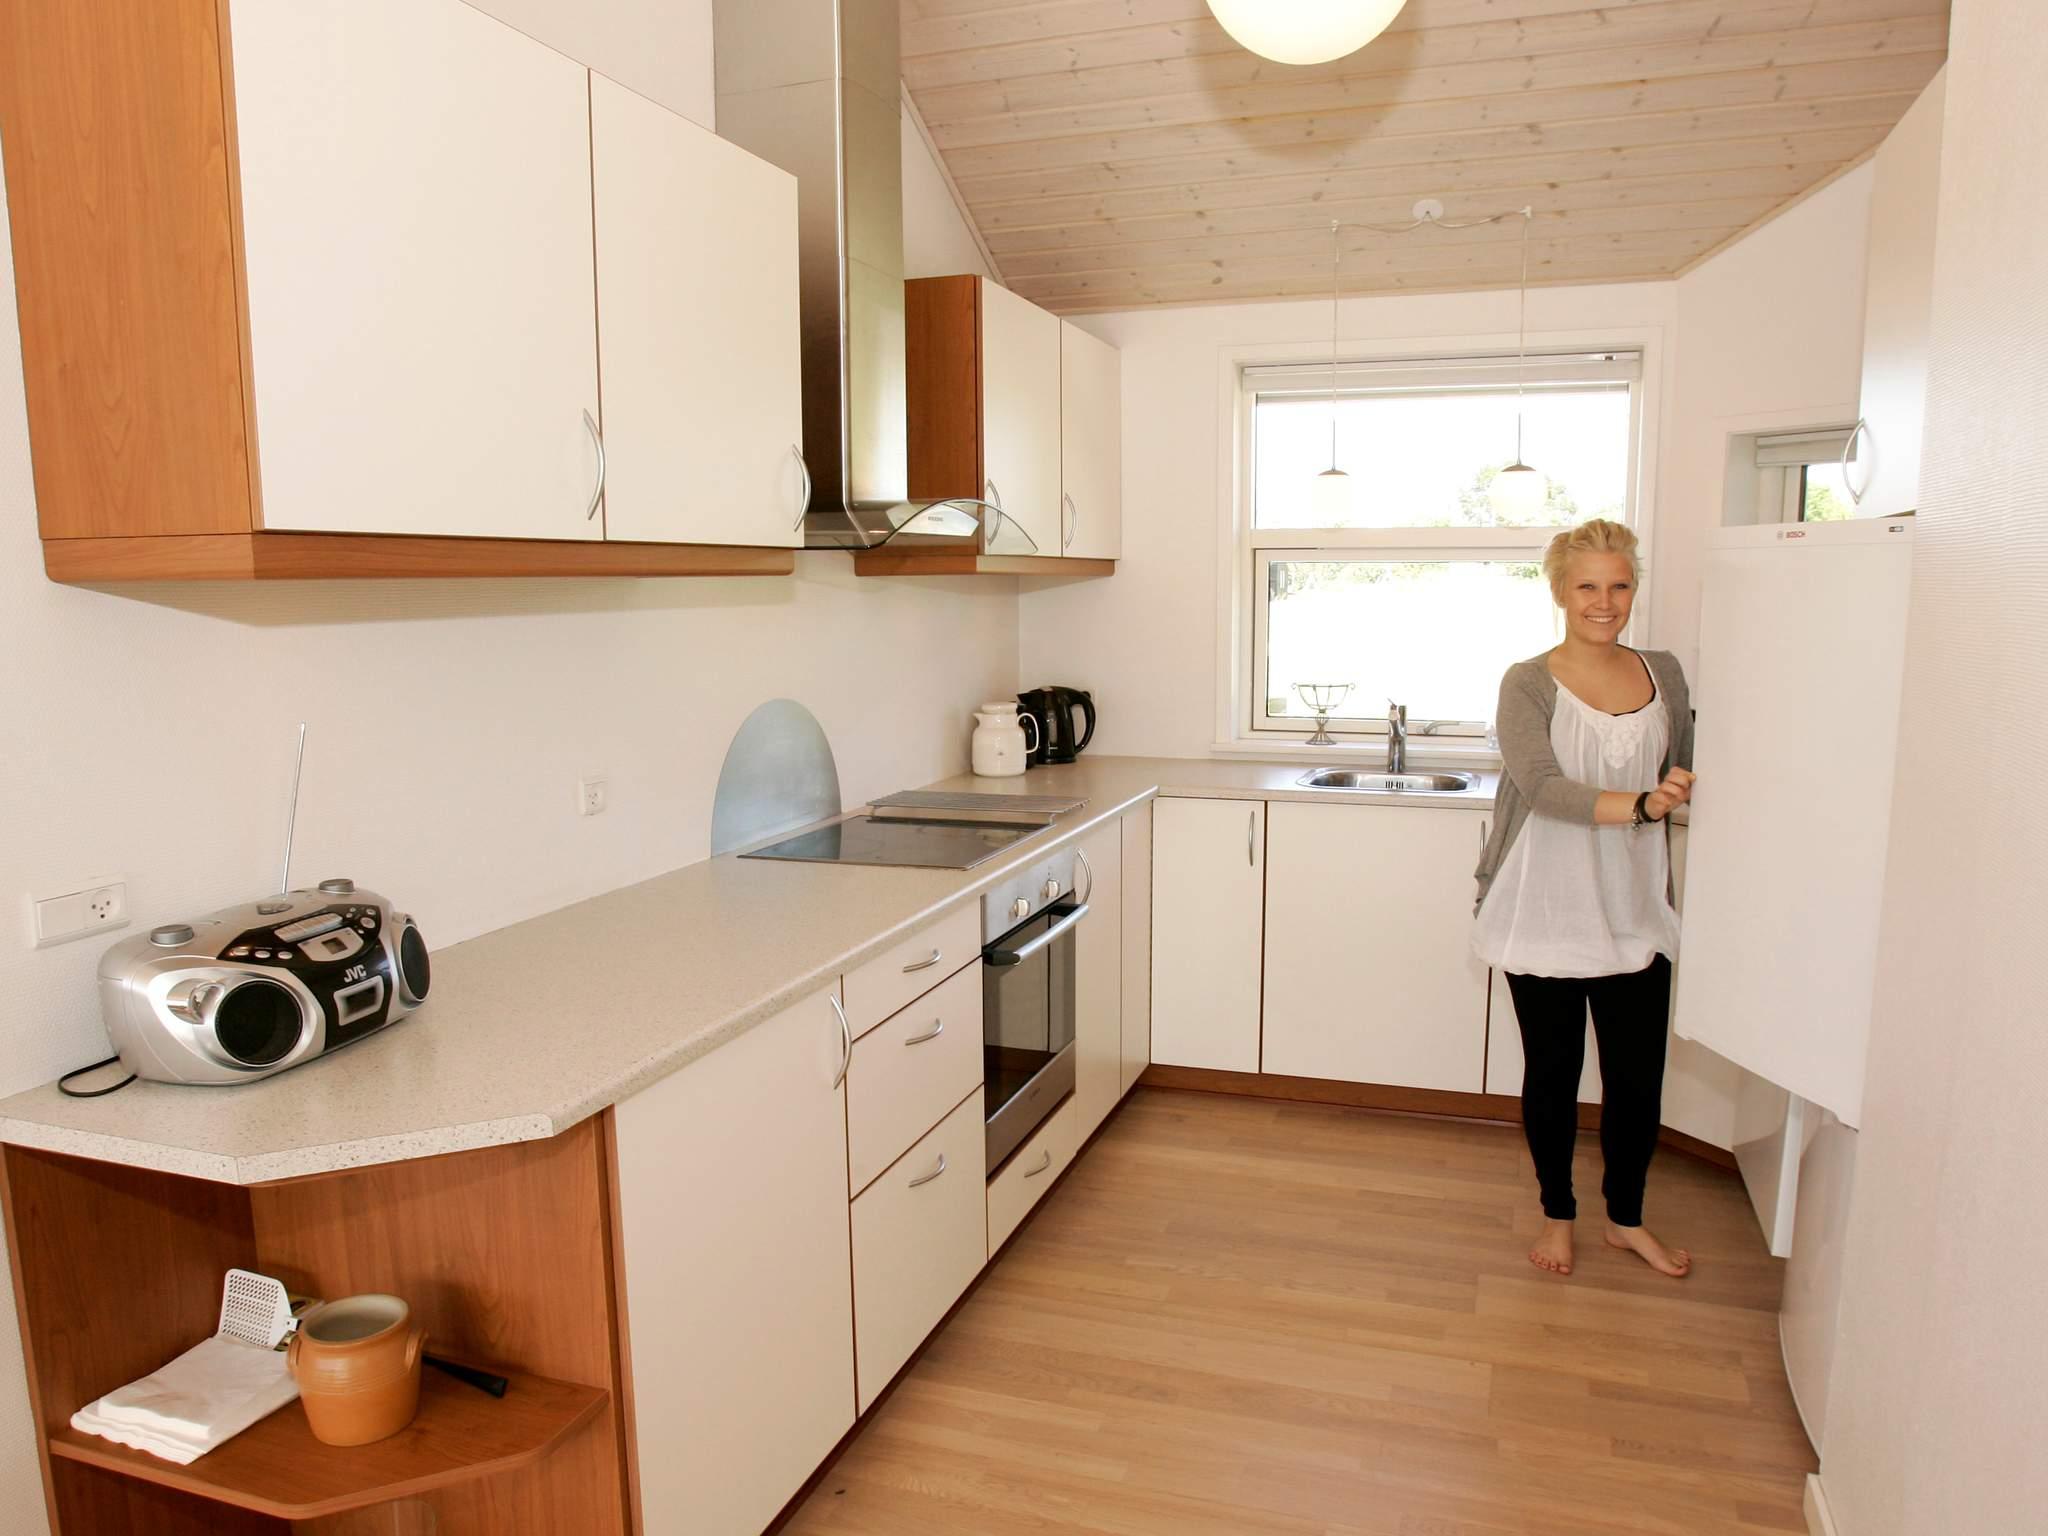 Ferienhaus Øster Hurup (487406), Øster Hurup, , Ostjütland, Dänemark, Bild 4